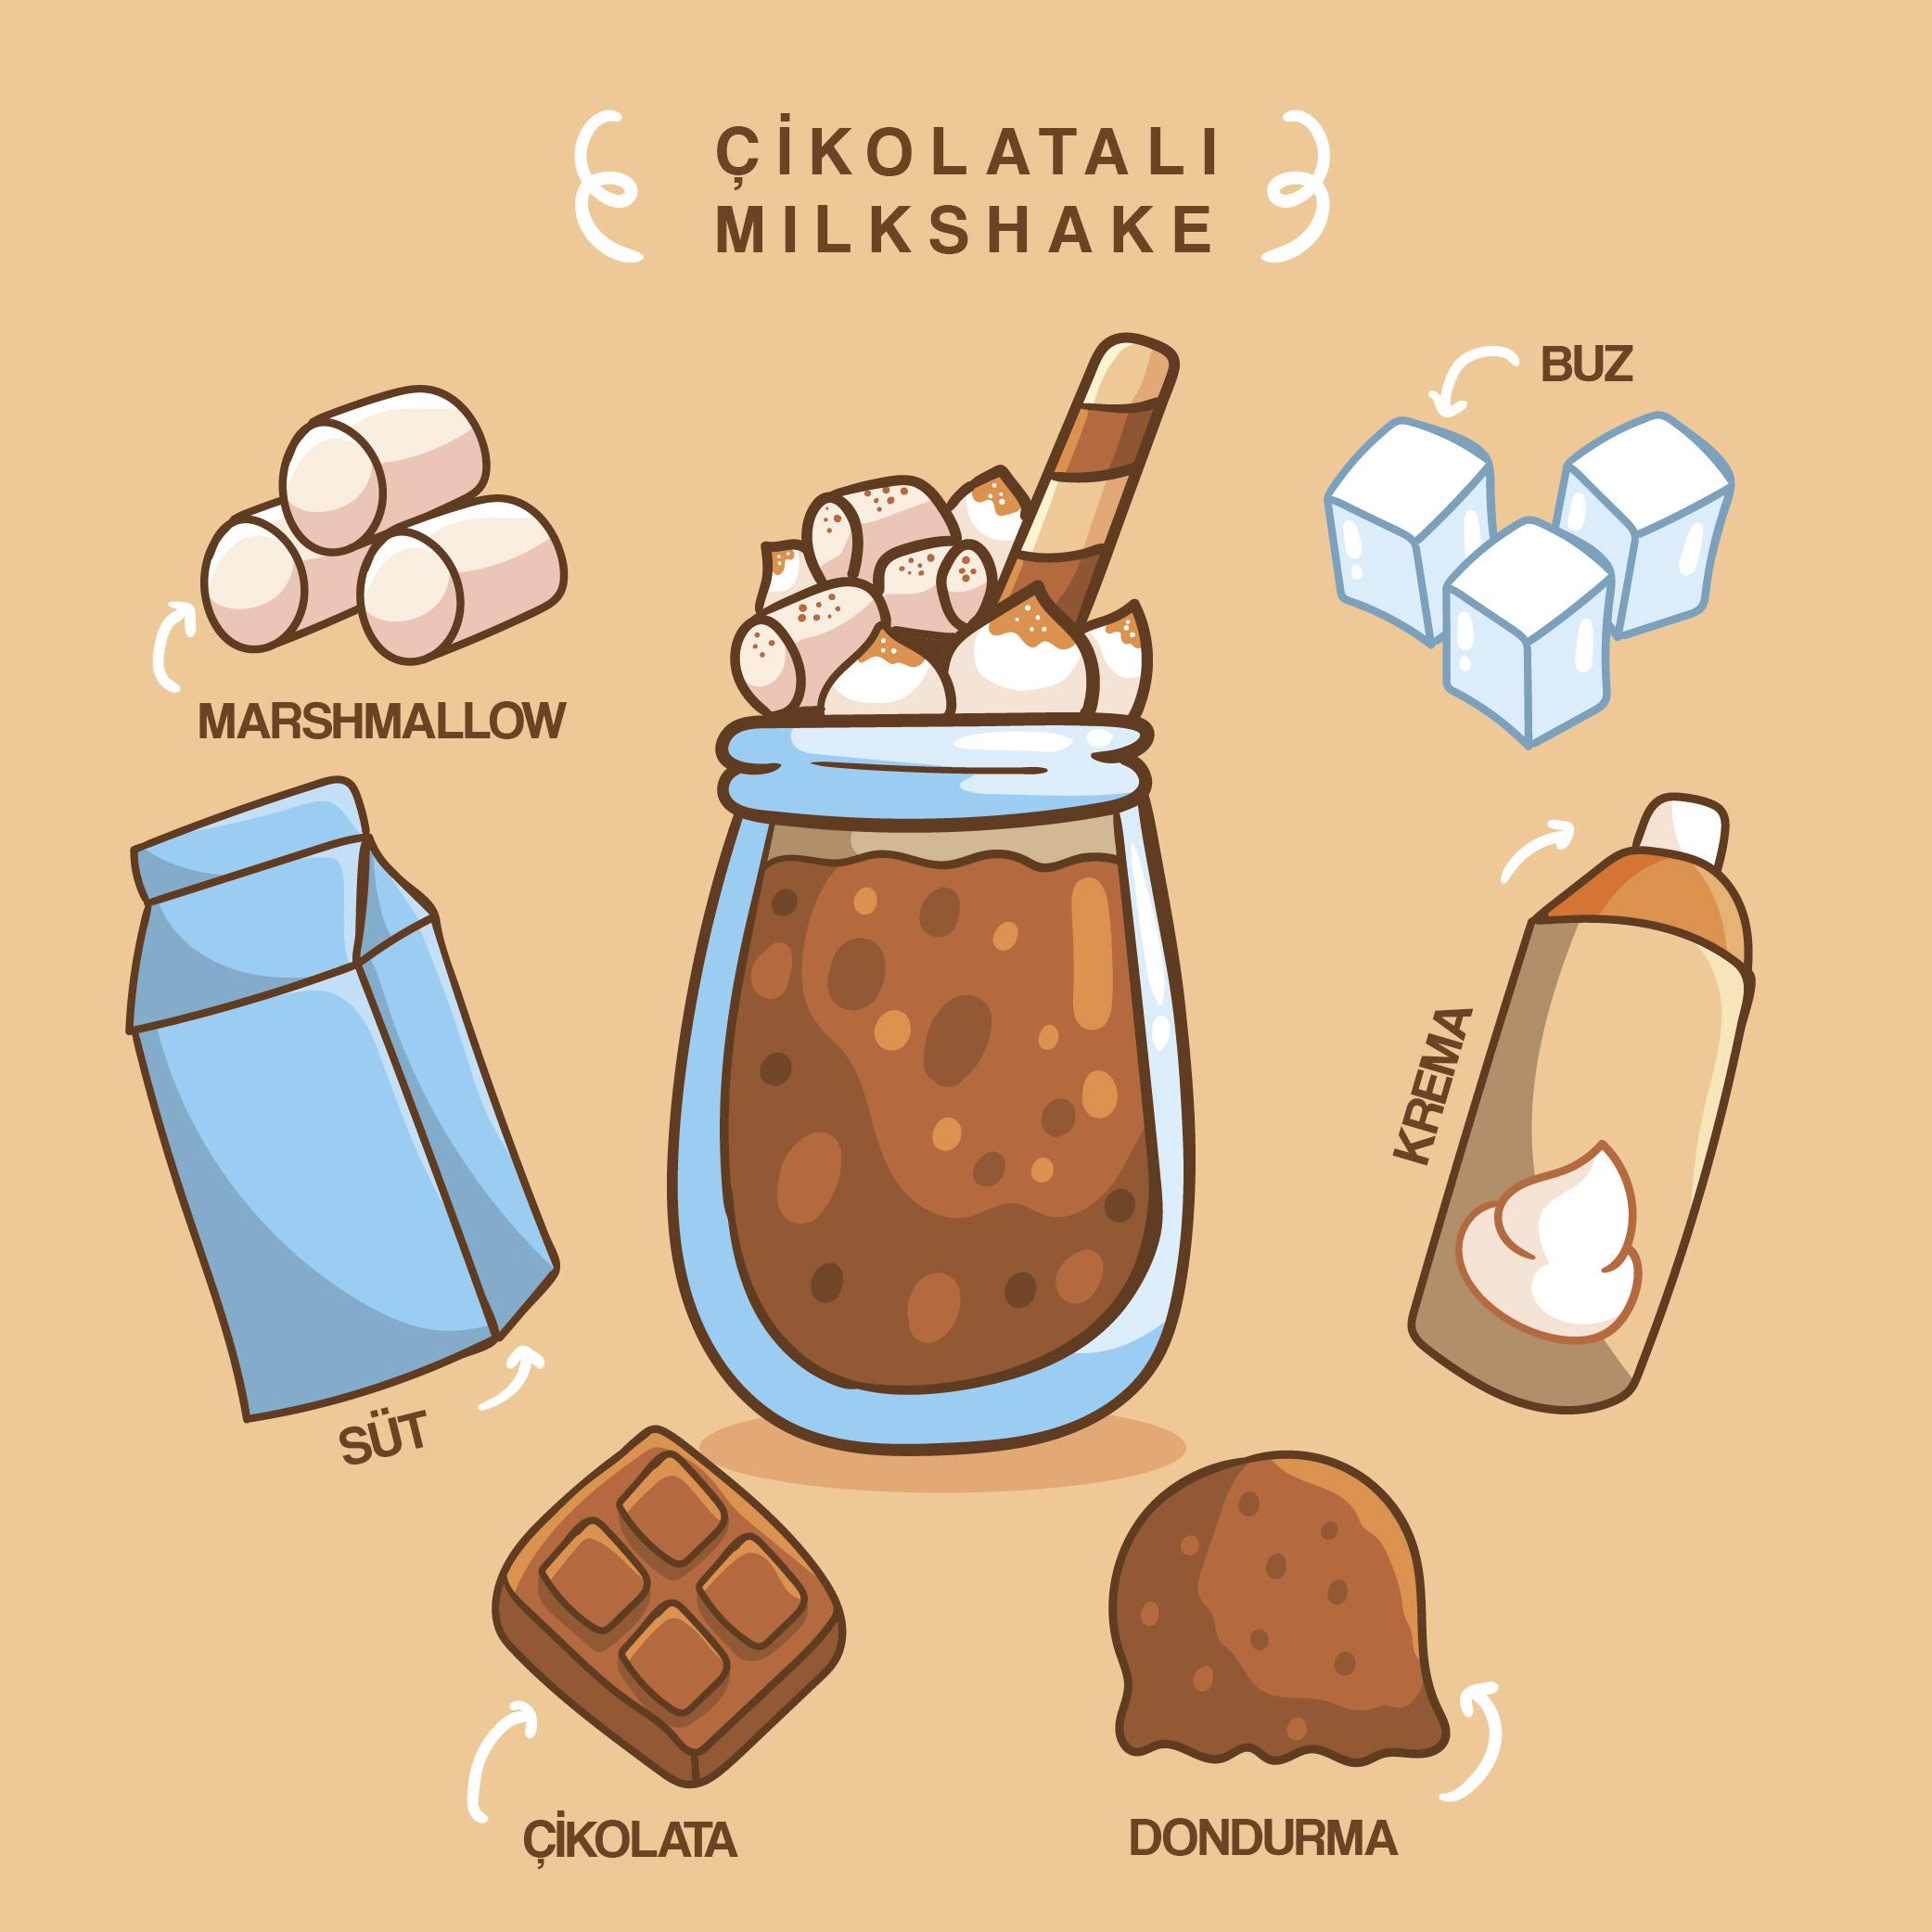 cikolatali-milkshake